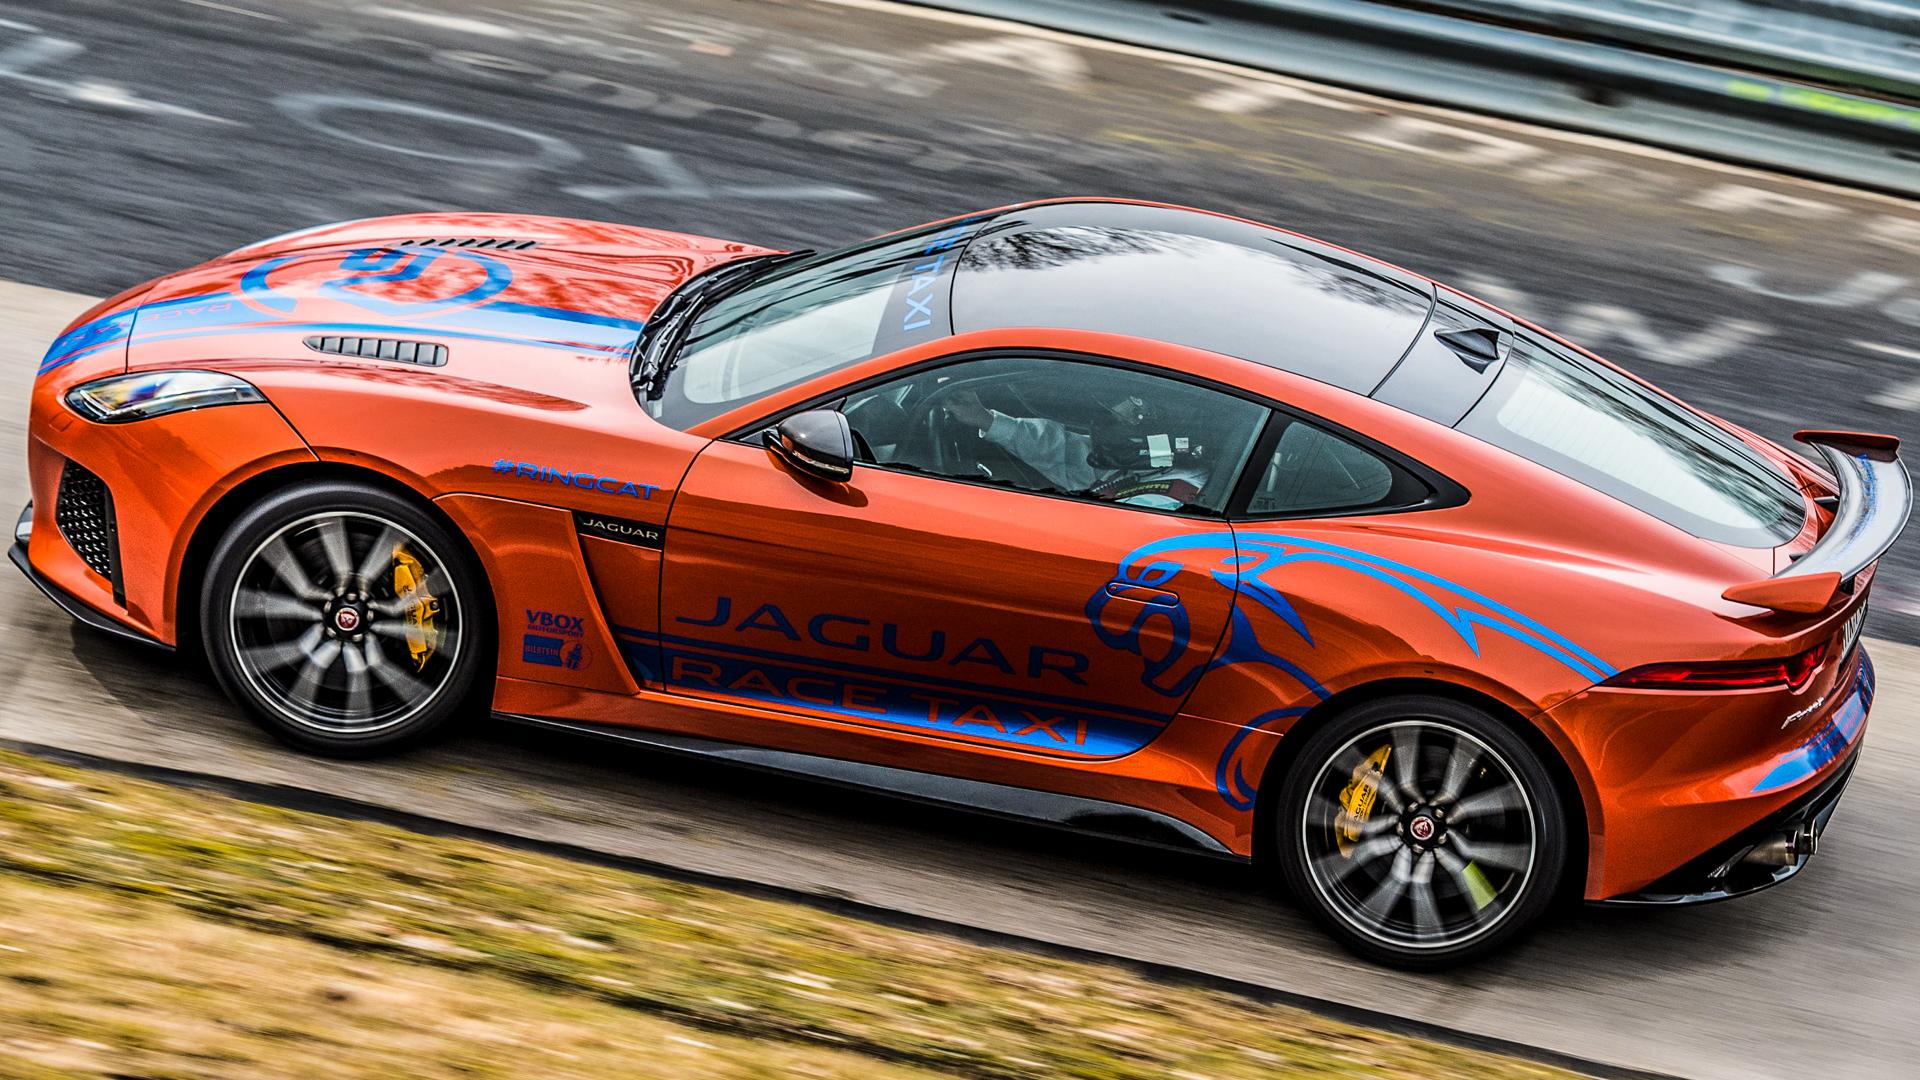 Jaguar F-Type SVR Race Taxi photo by Lorenzo!